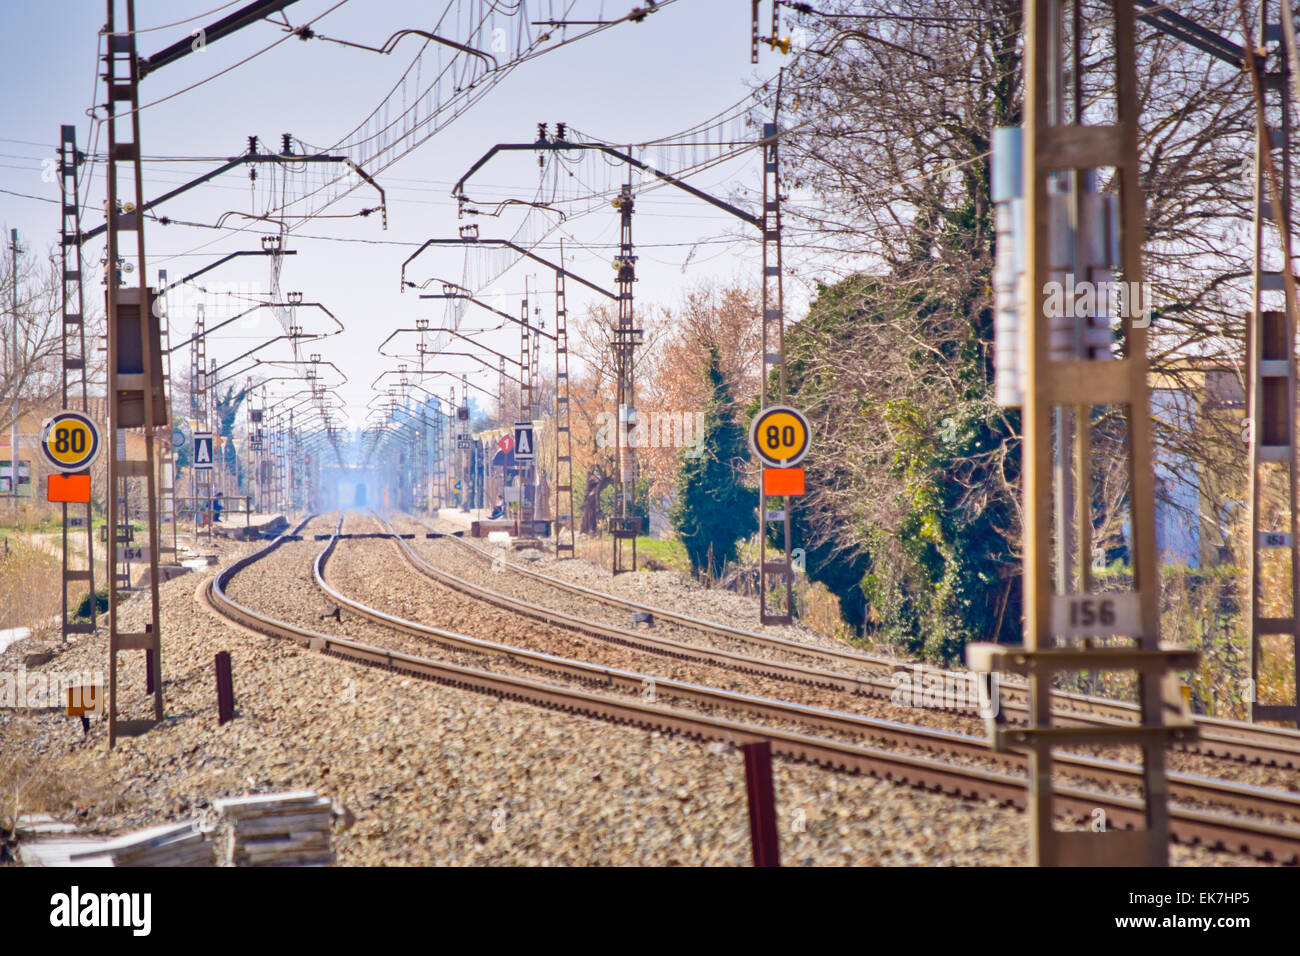 Rails. Barcelona province, Catalonia, Spain. - Stock Image